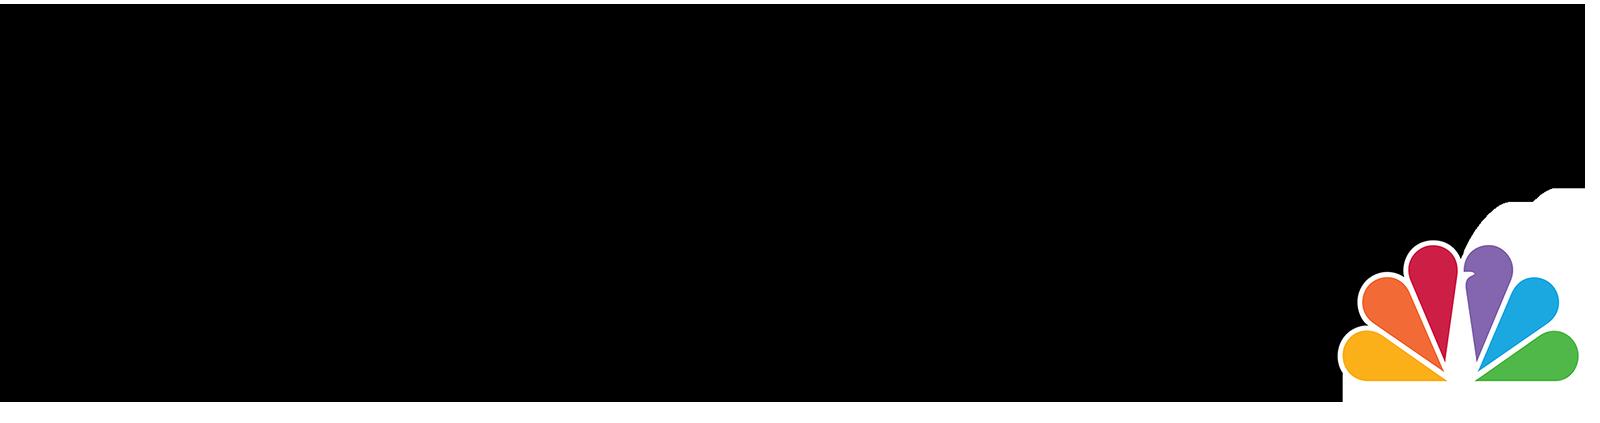 WKYC News logo